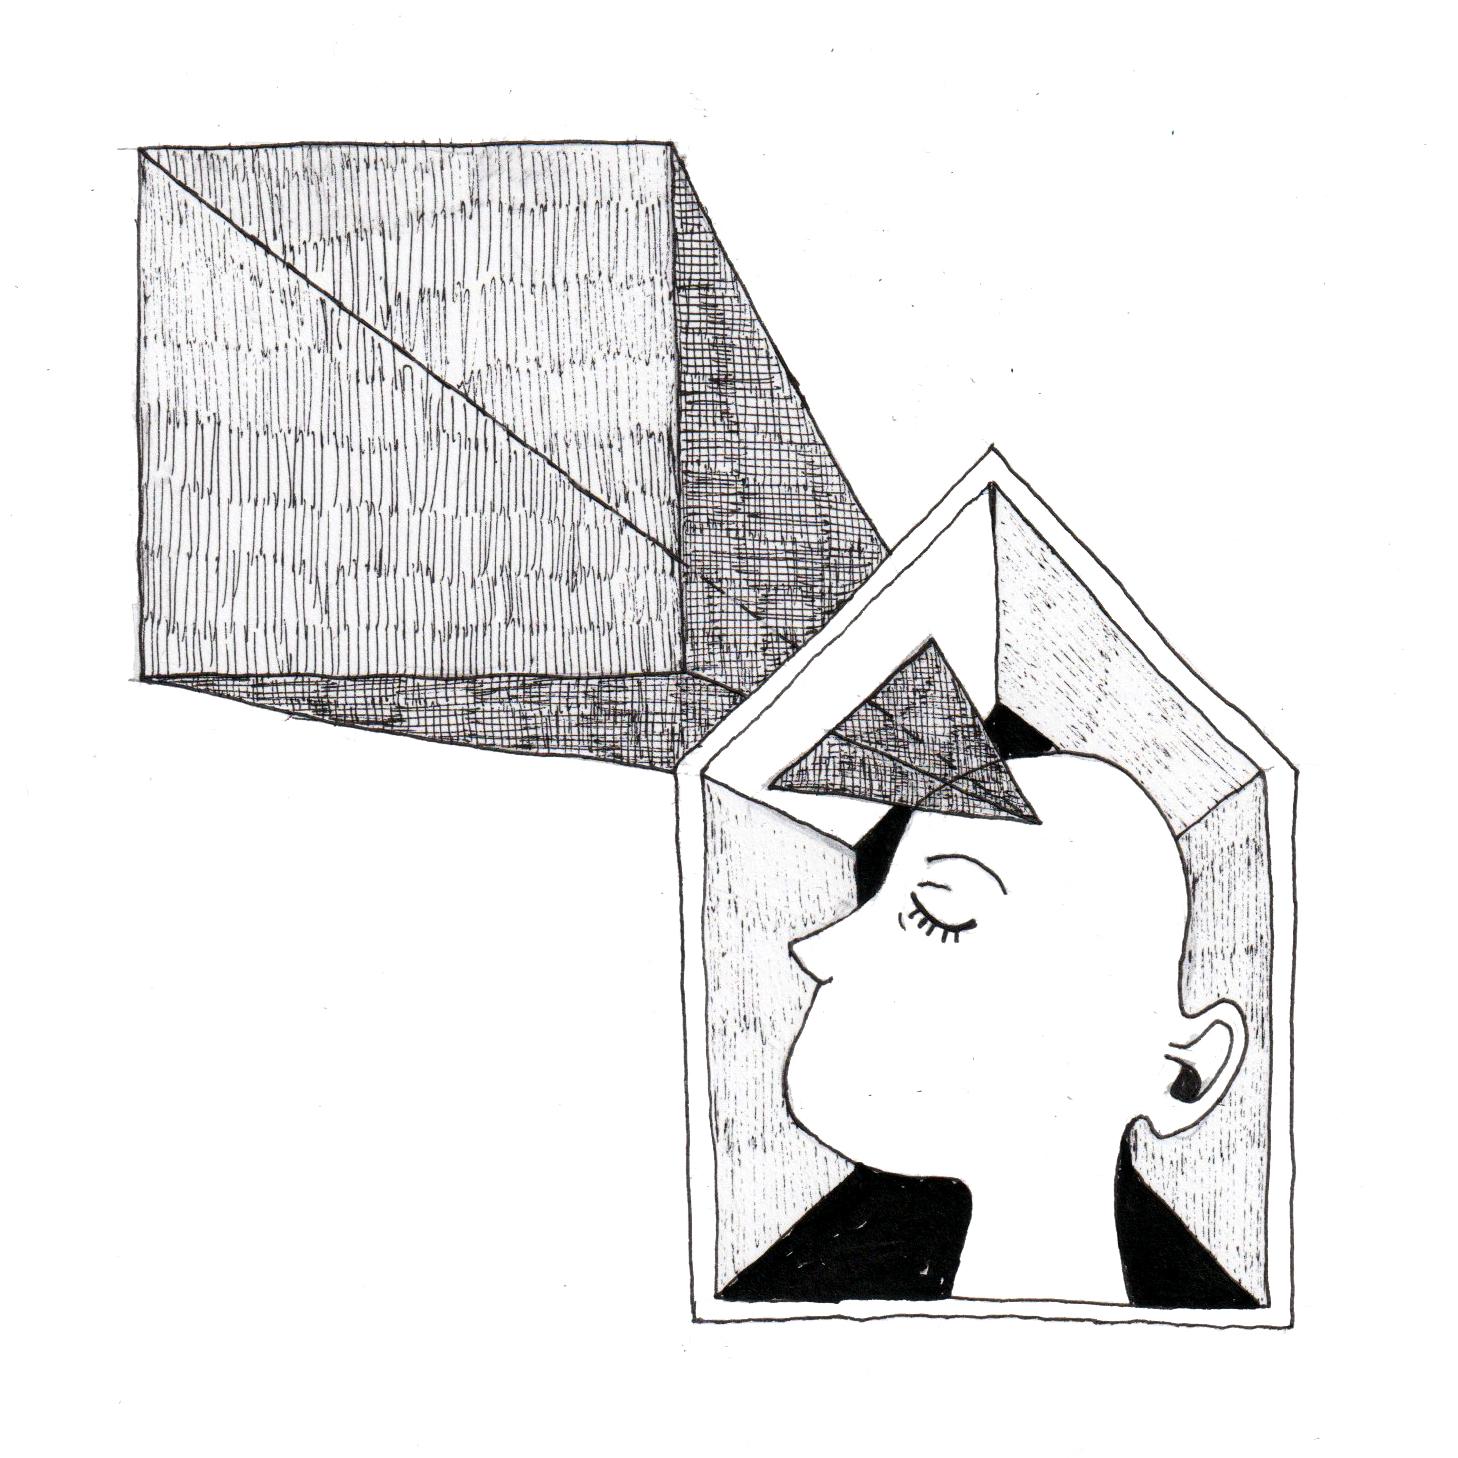 Original Drawing by Tori Haynes